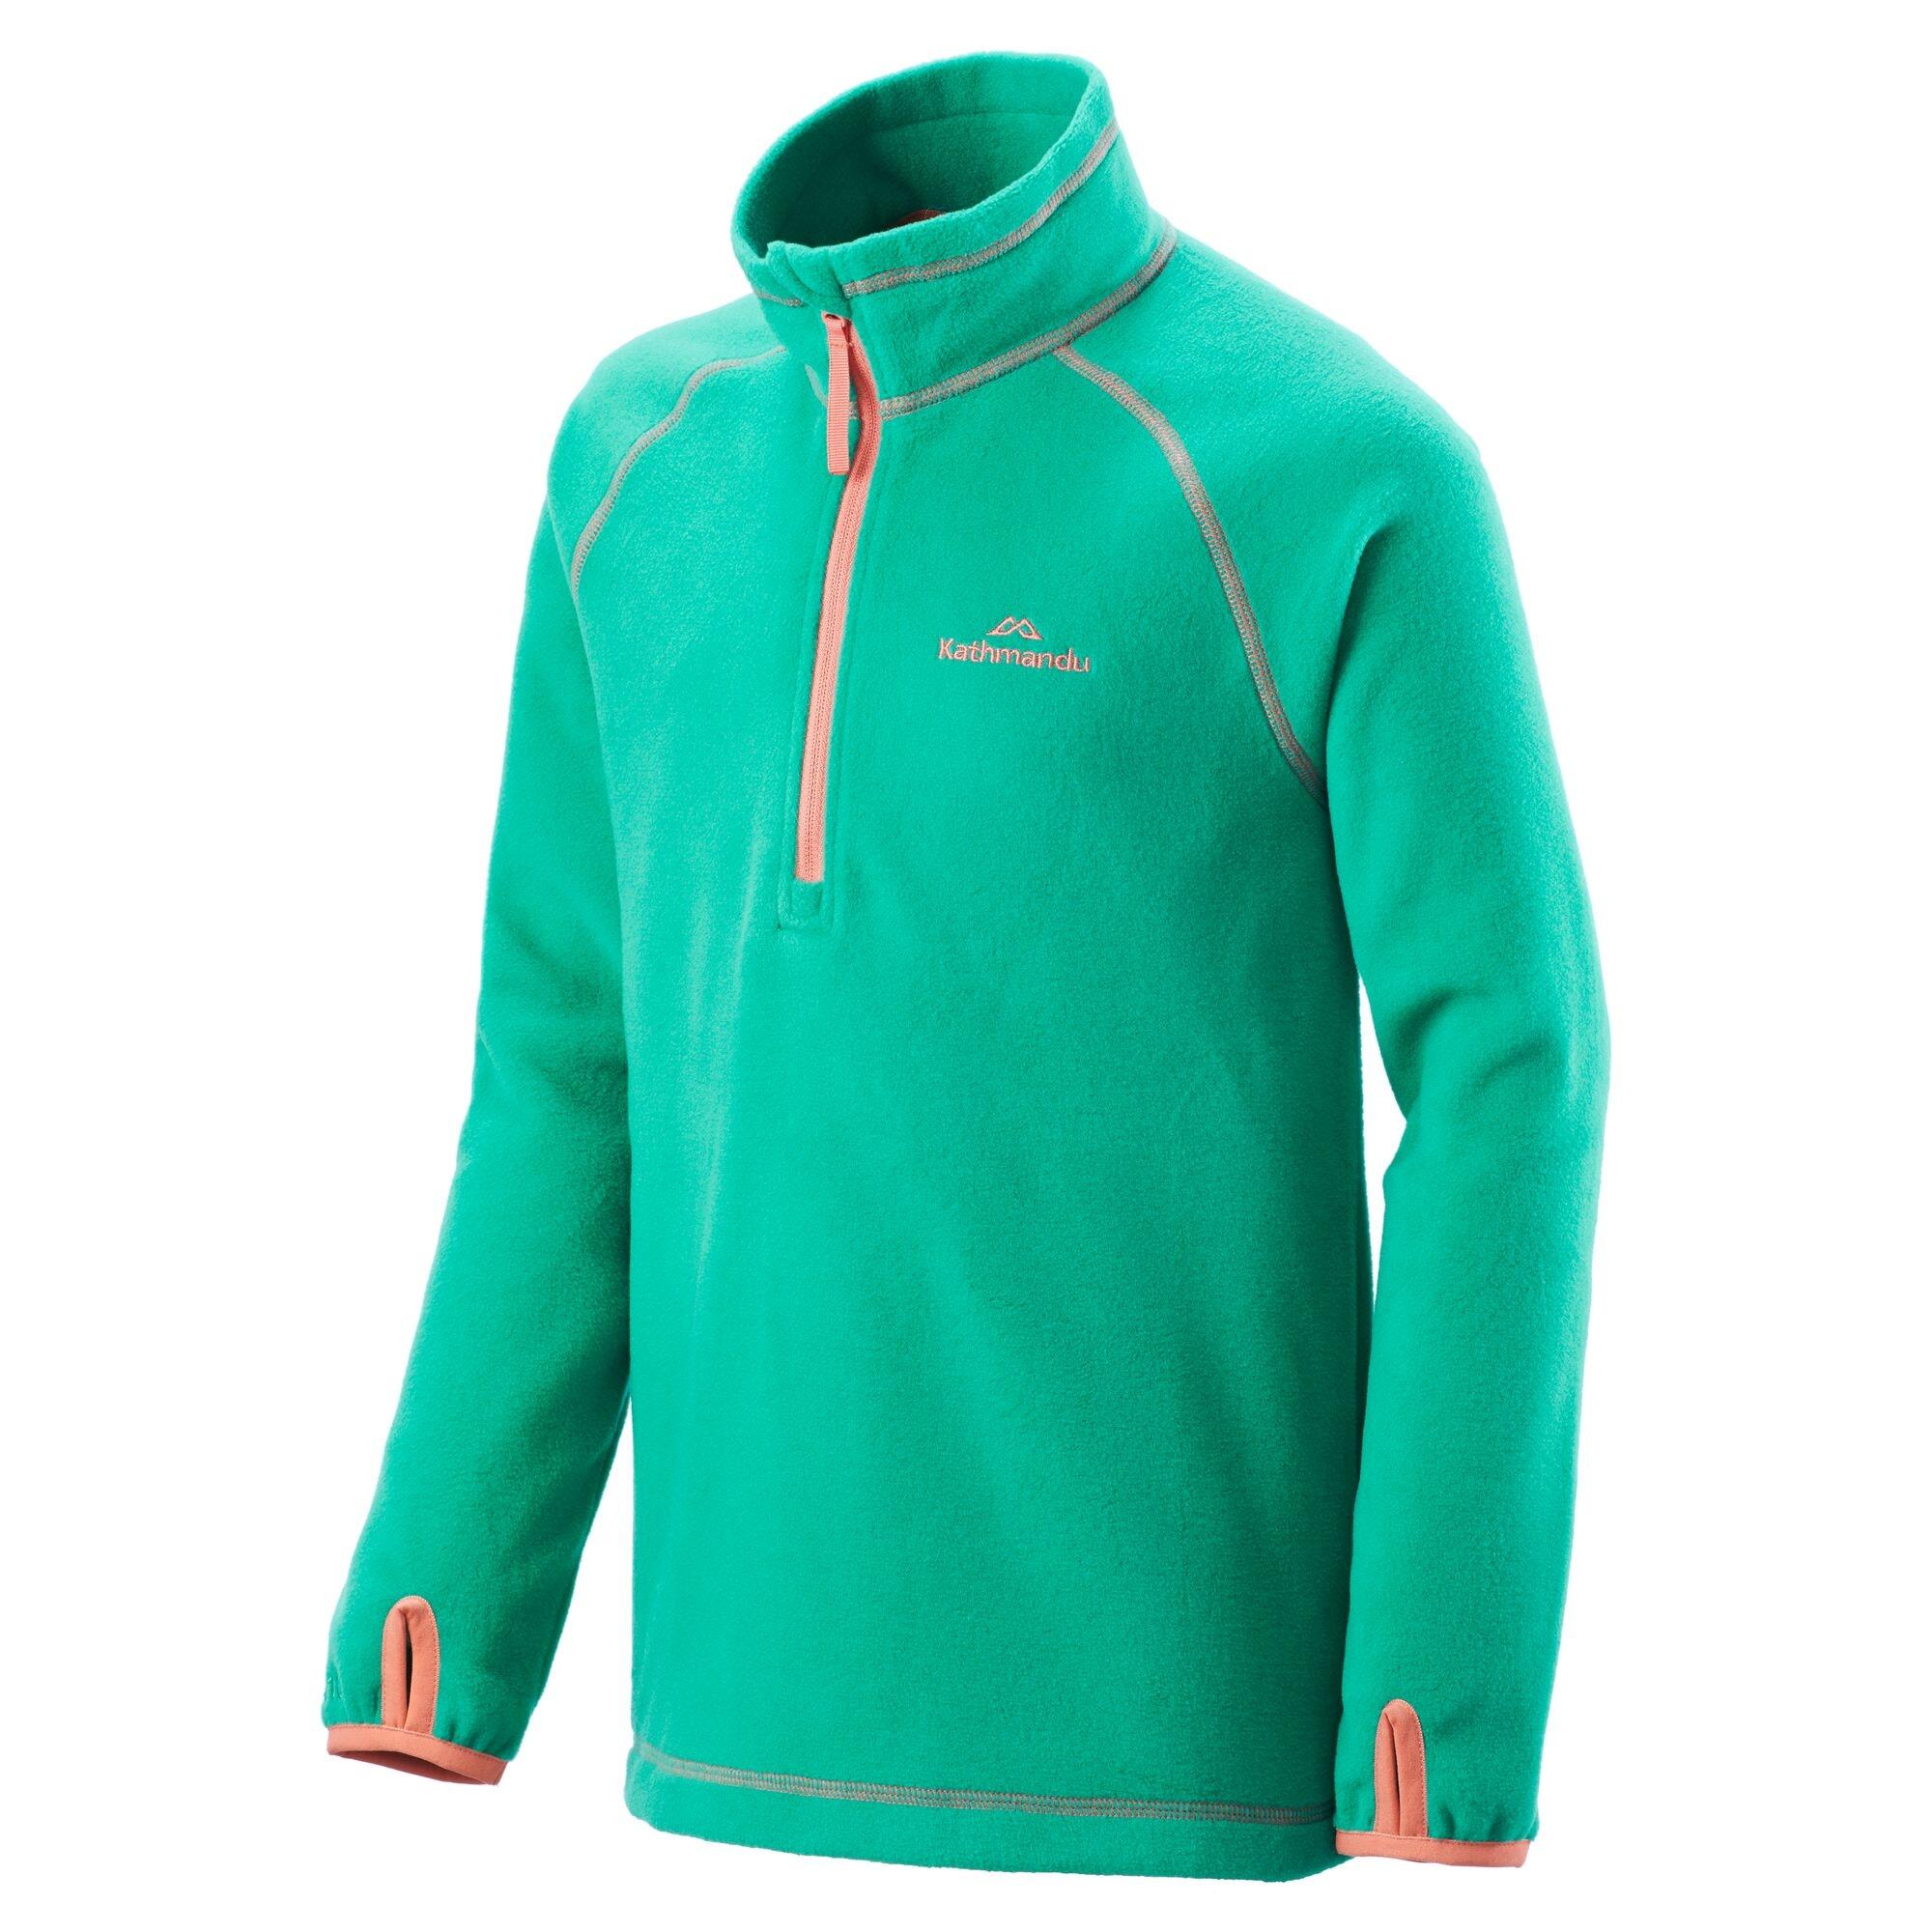 NEW-Kathmandu-Ridge-Kids-039-Girls-039-Boys-039-Warm-Fleece-Jacket-1-4-Zip-Pullover-Top thumbnail 27